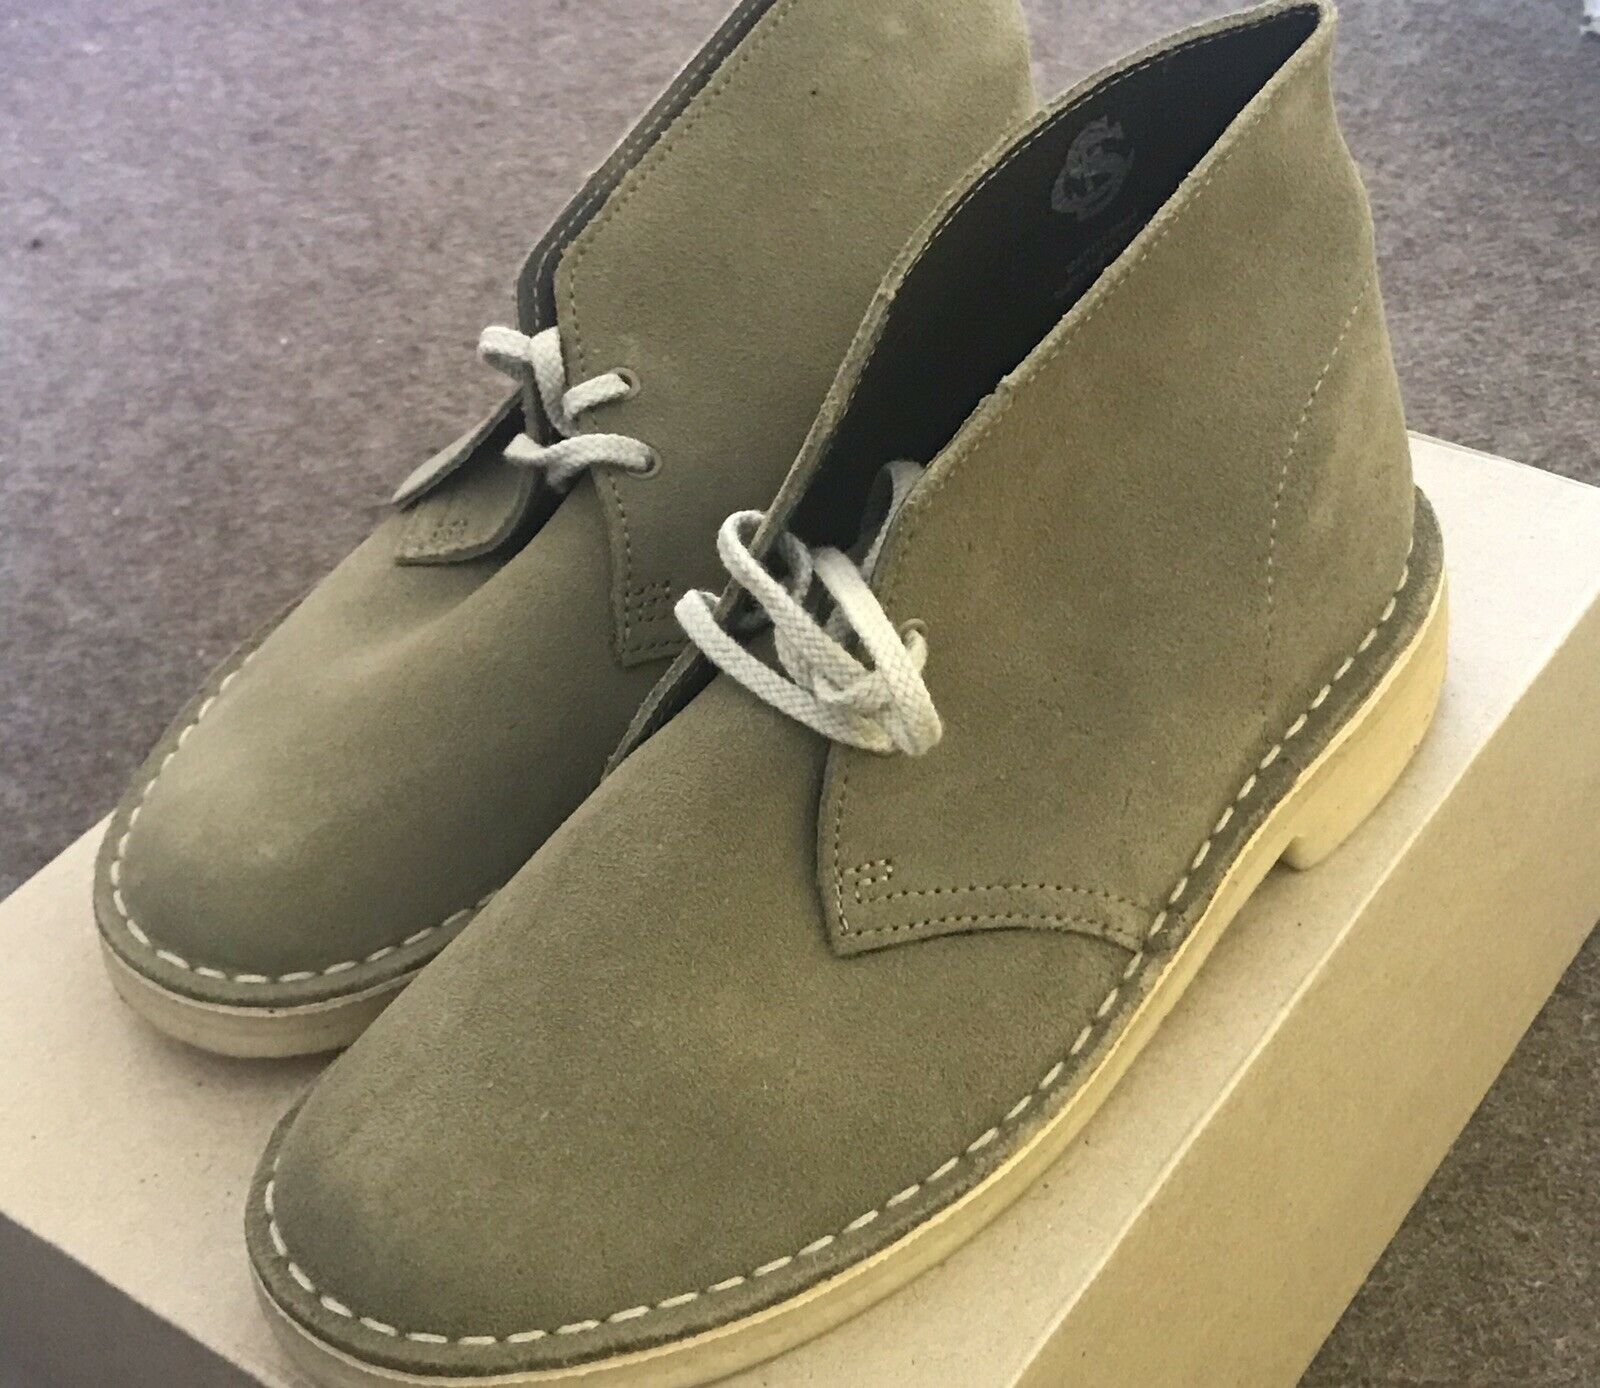 Clarks Originals Men Desert Boot Olive UK Size 5G/38